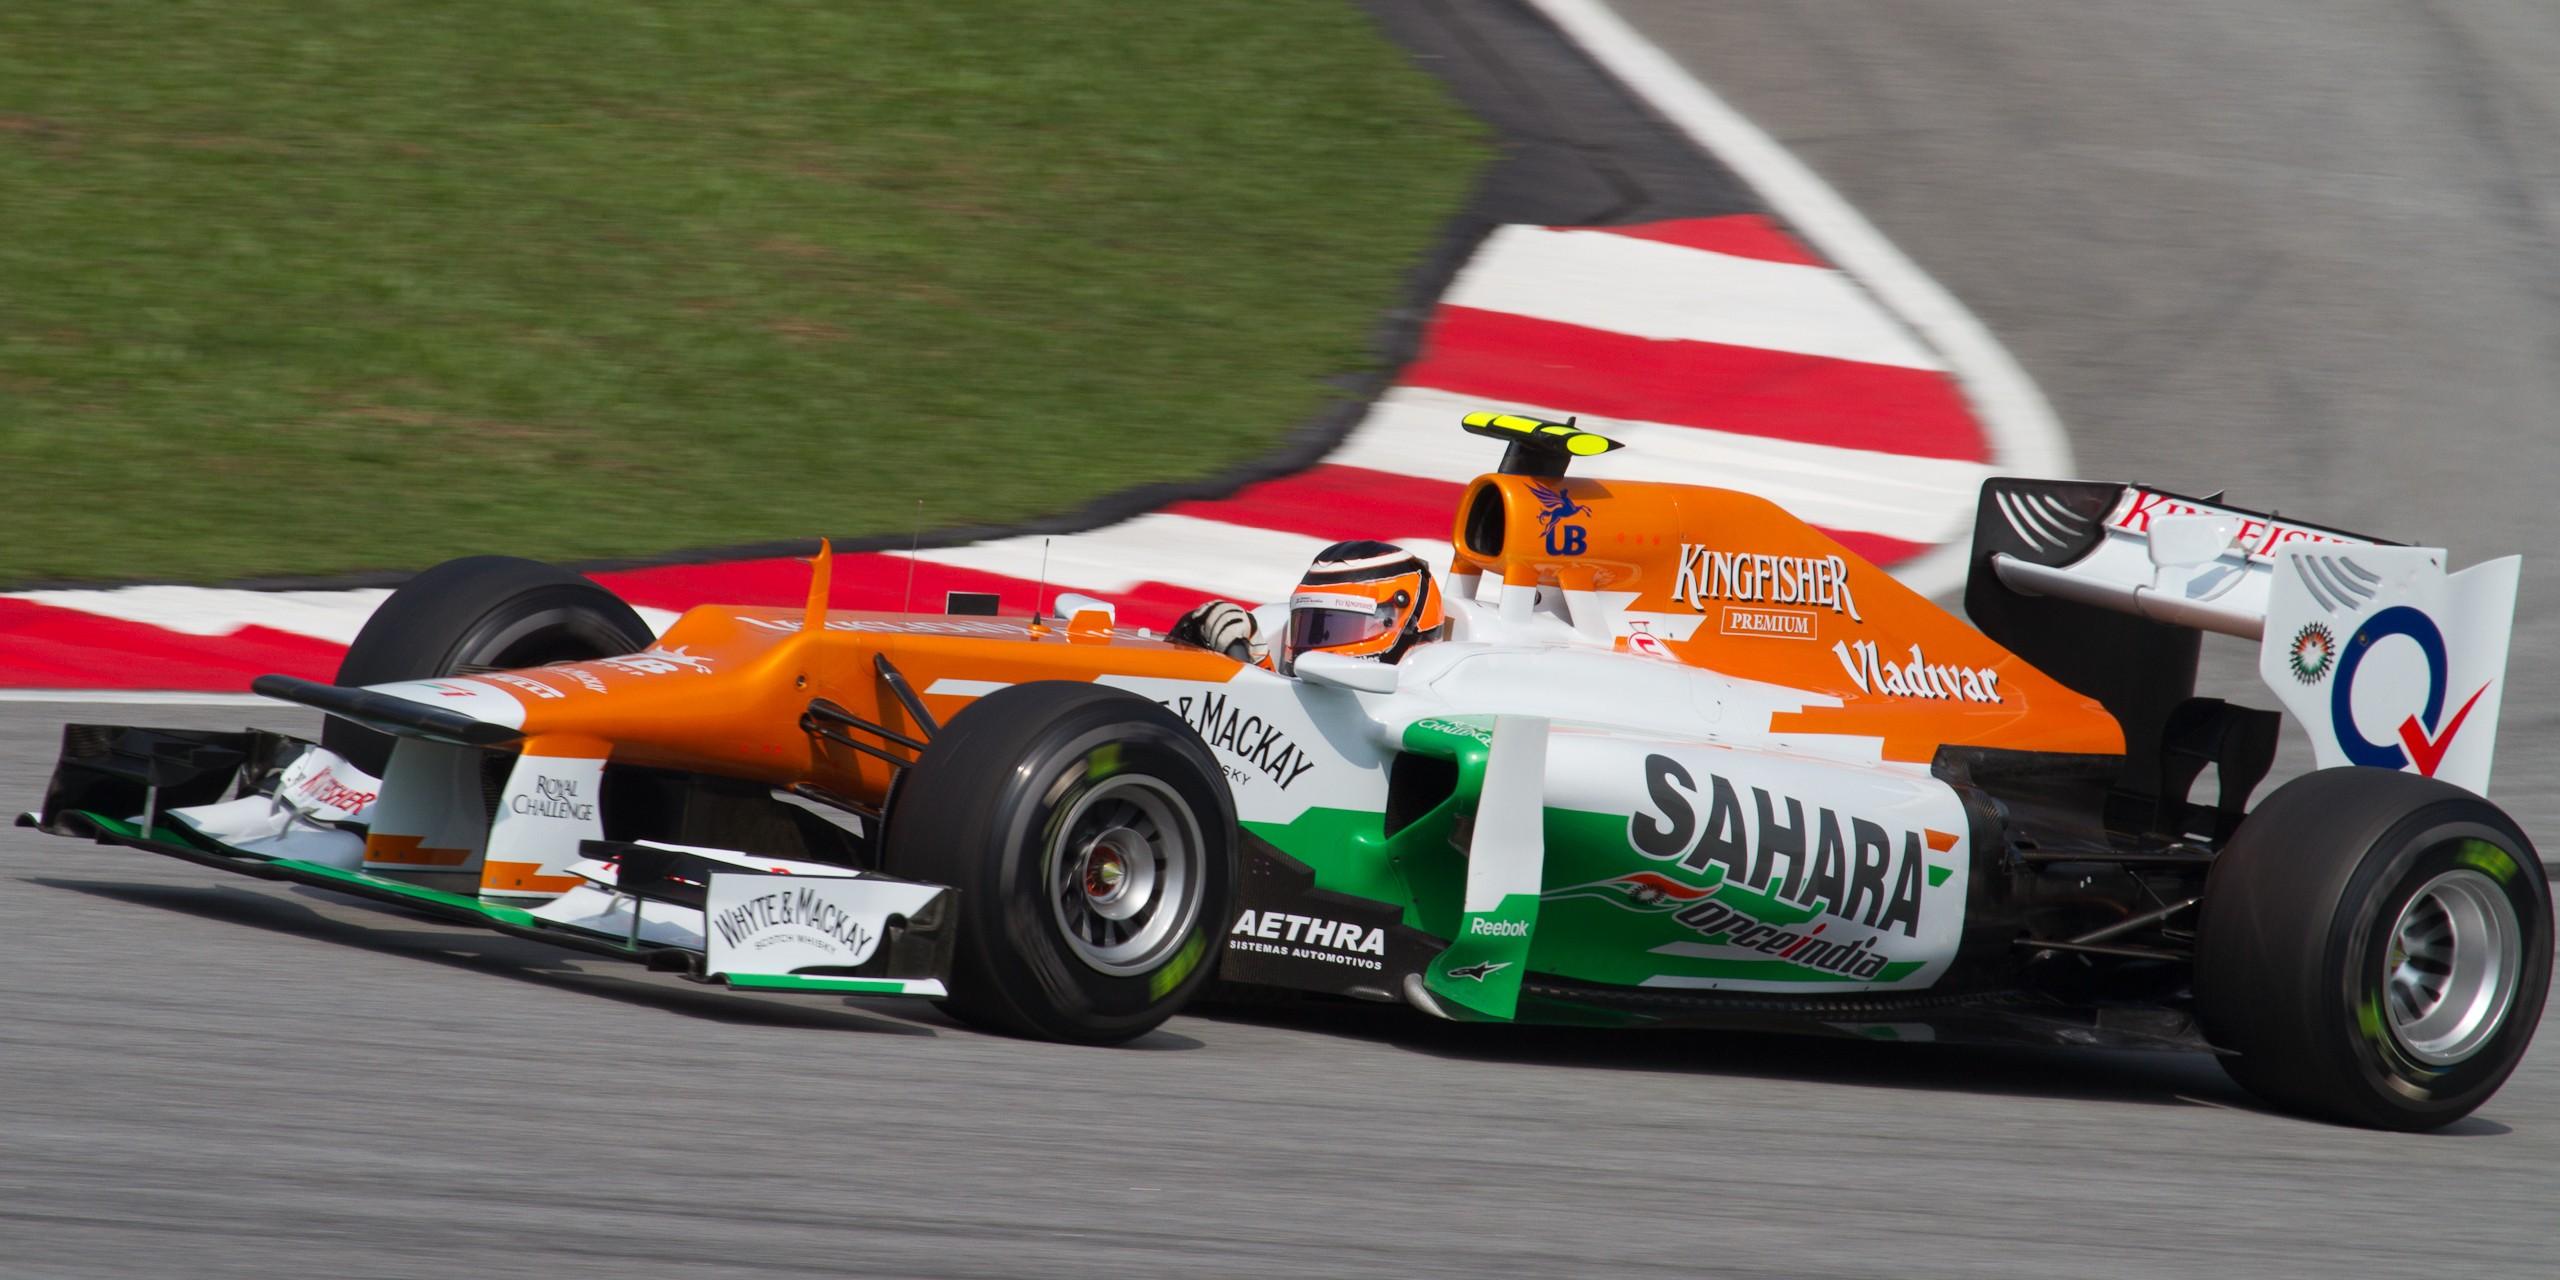 Nico_Hulkenberg_2012_Malaysia_Qualify.jp